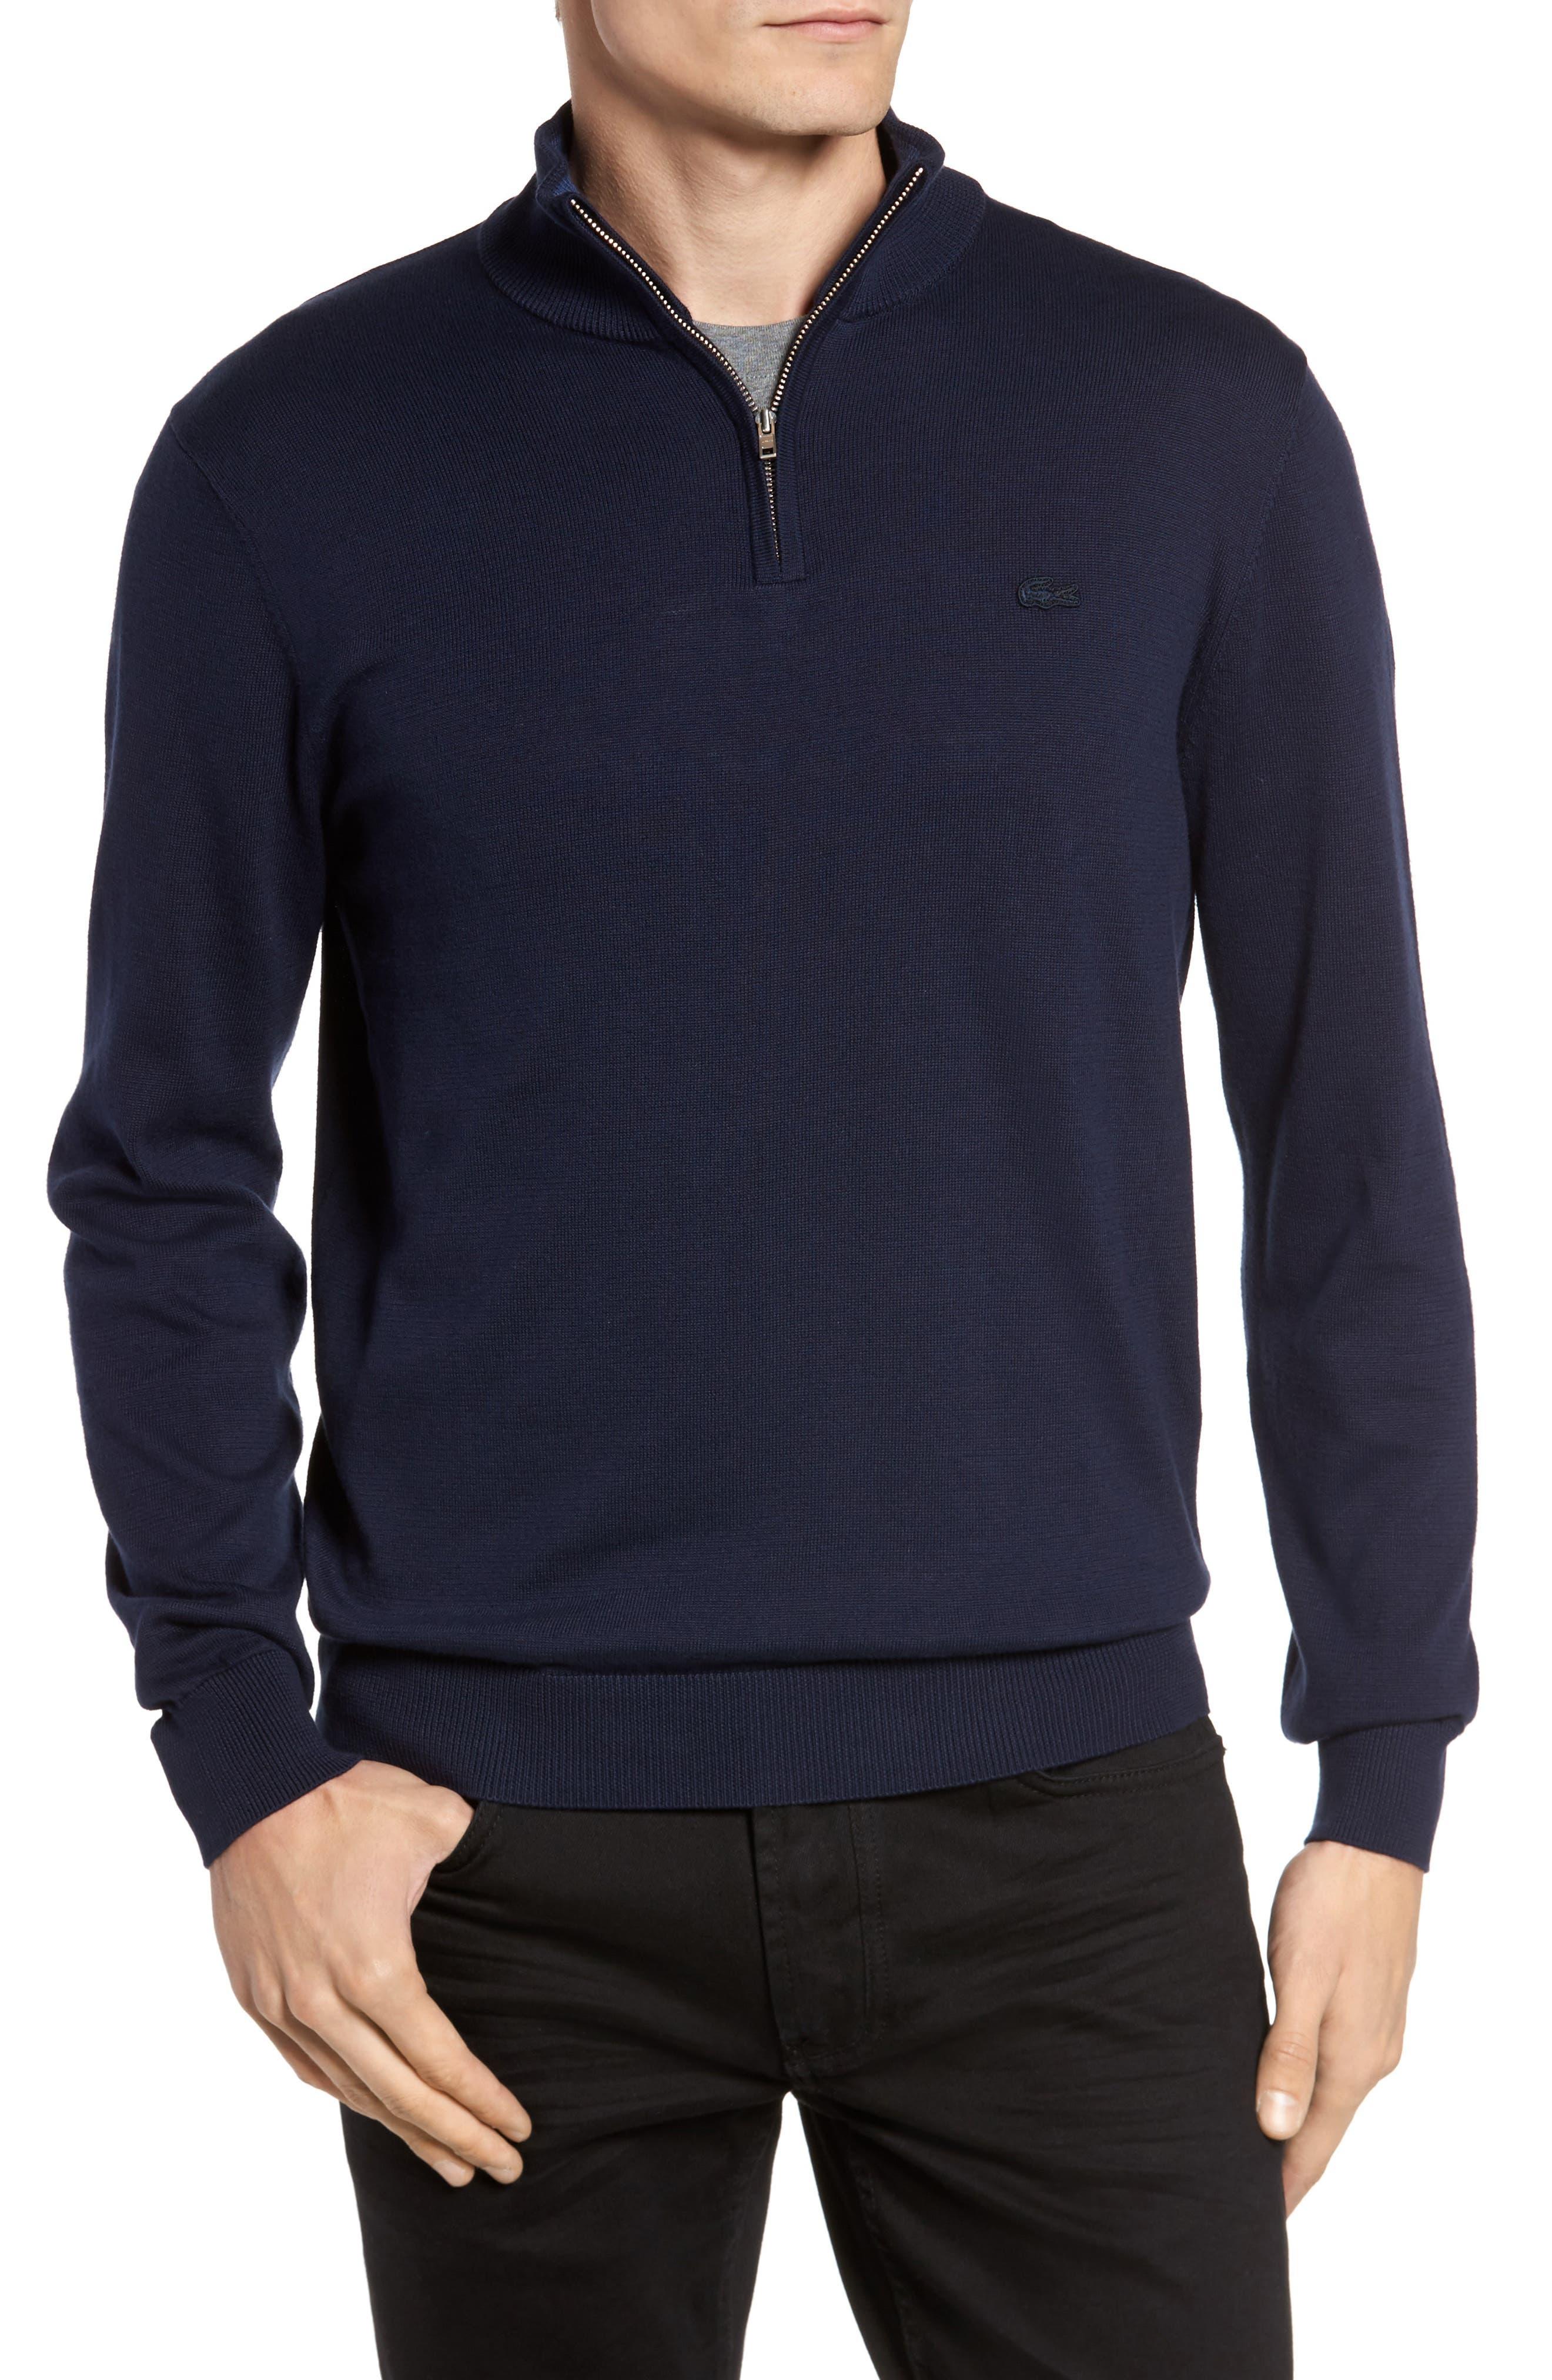 Alternate Image 1 Selected - Lacoste Quarter Zip Sweater